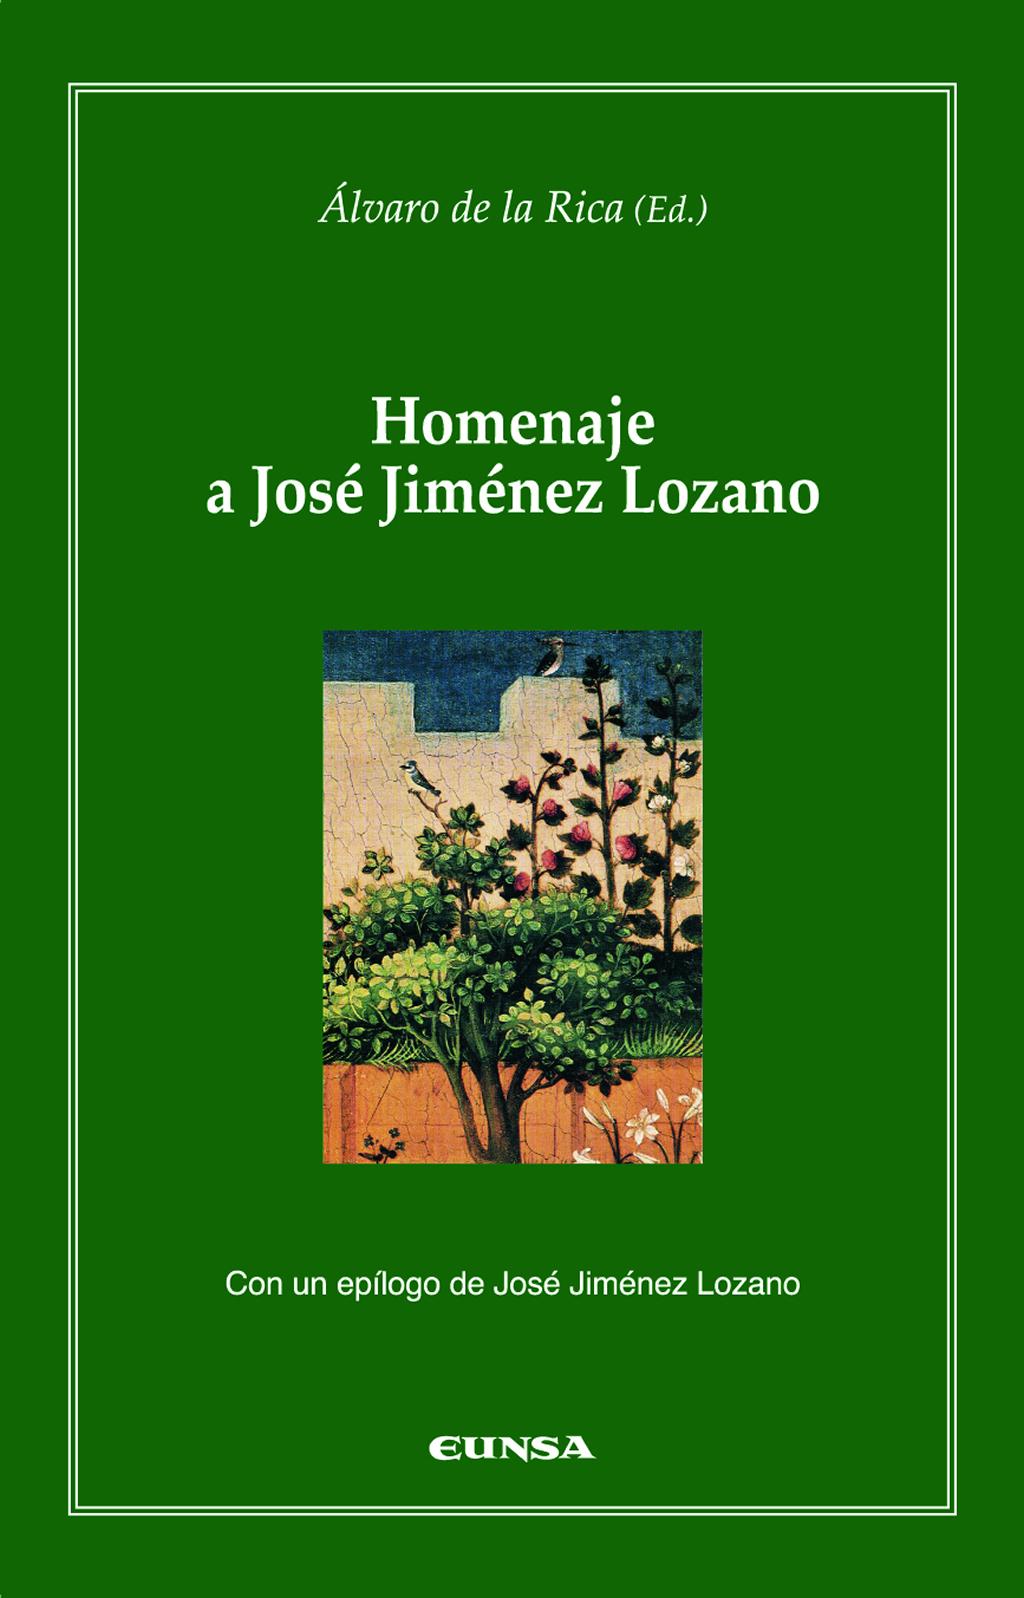 Homenaje-a-Jose-jimenez